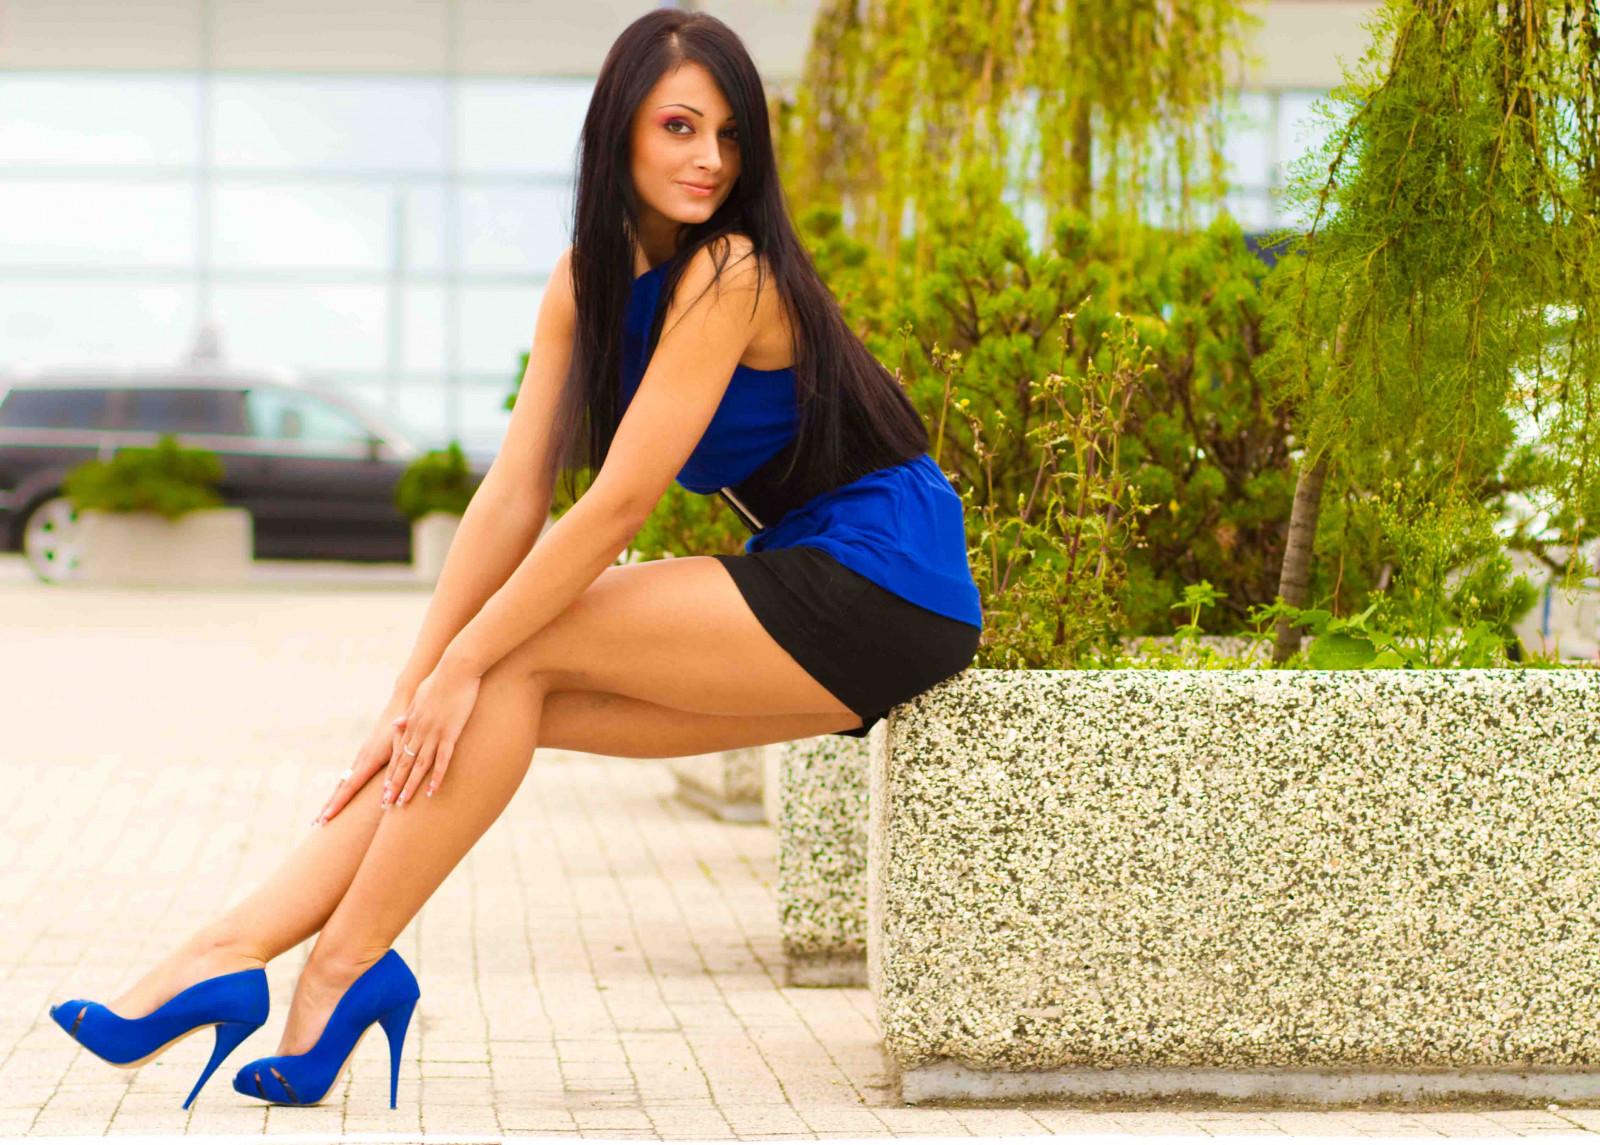 Wallpaper : model, city, long hair, legs, sitting, heels